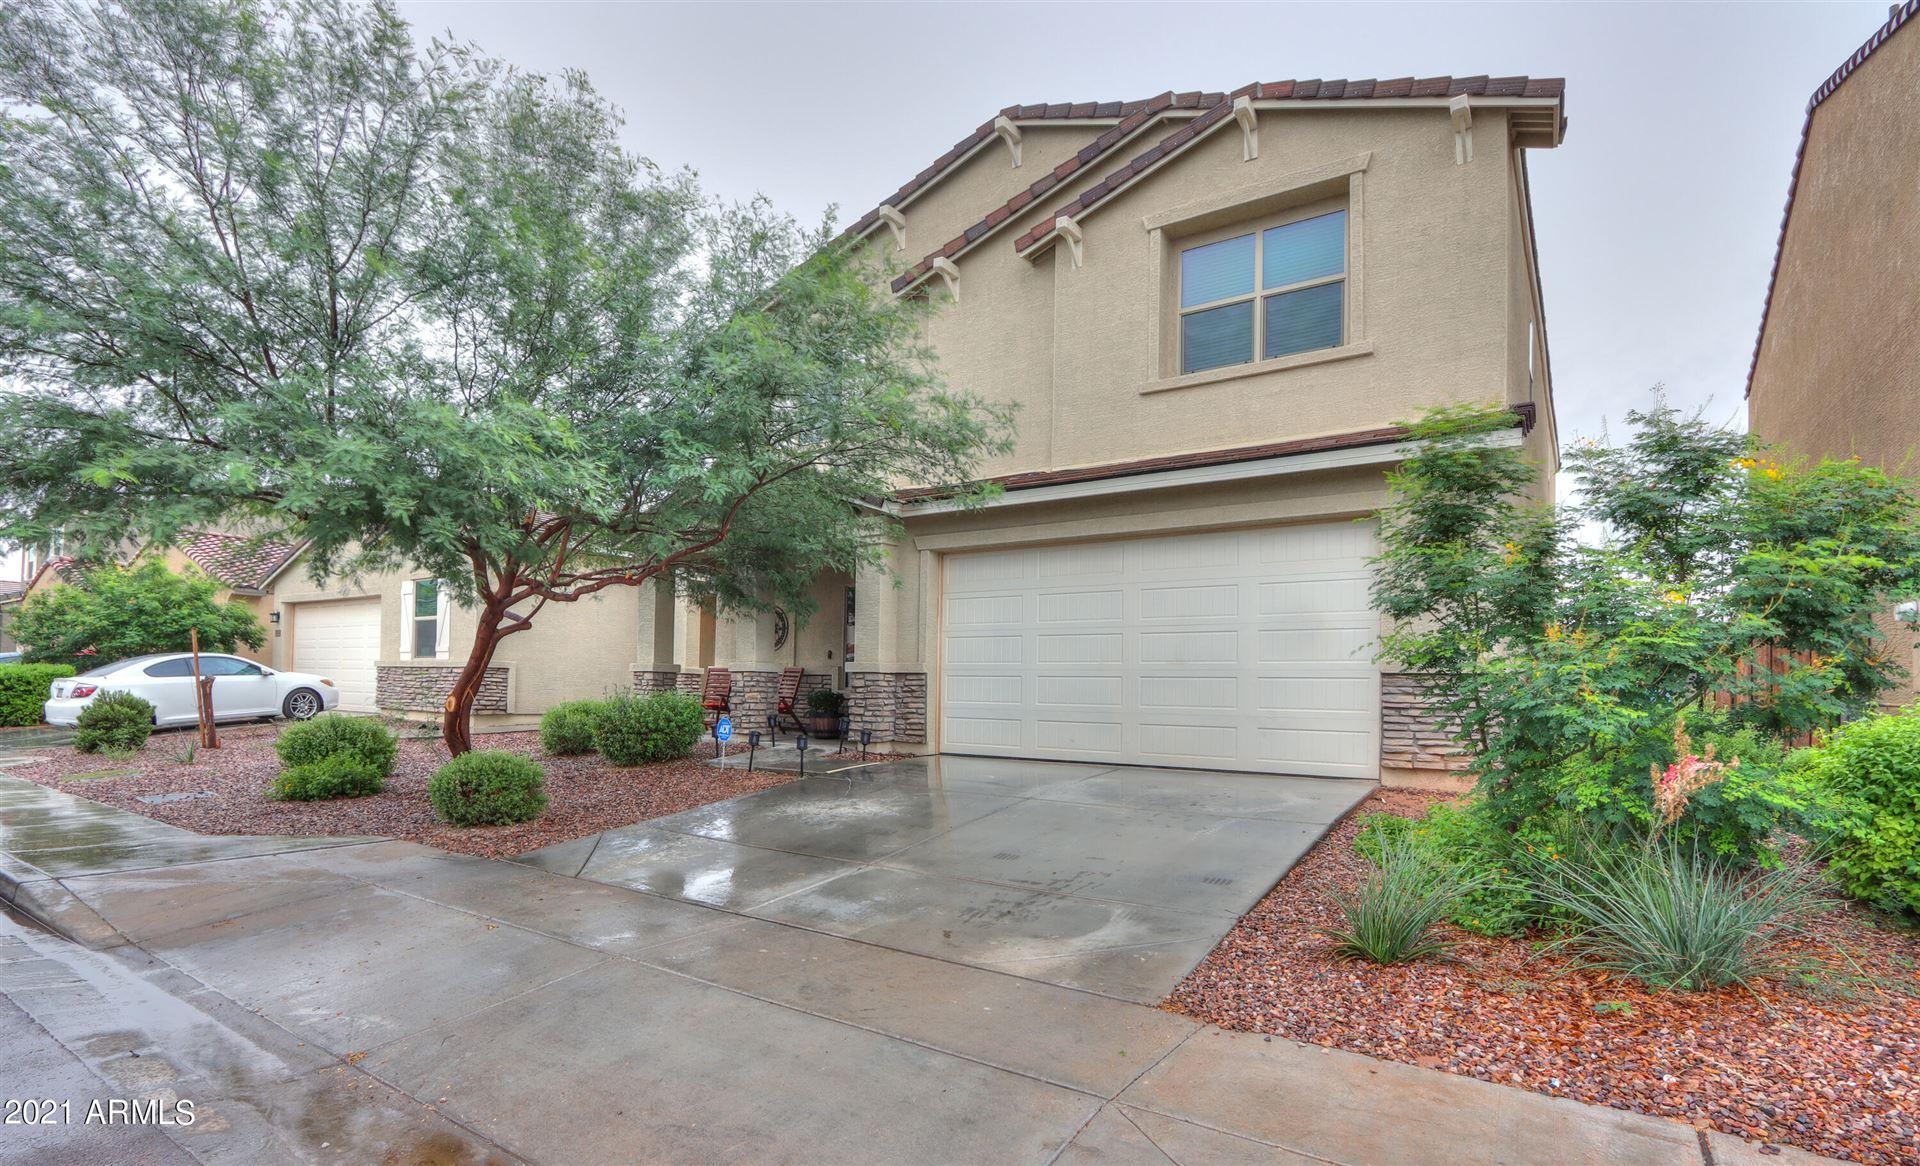 Photo of 9749 W SOUTHGATE Avenue, Tolleson, AZ 85353 (MLS # 6302051)